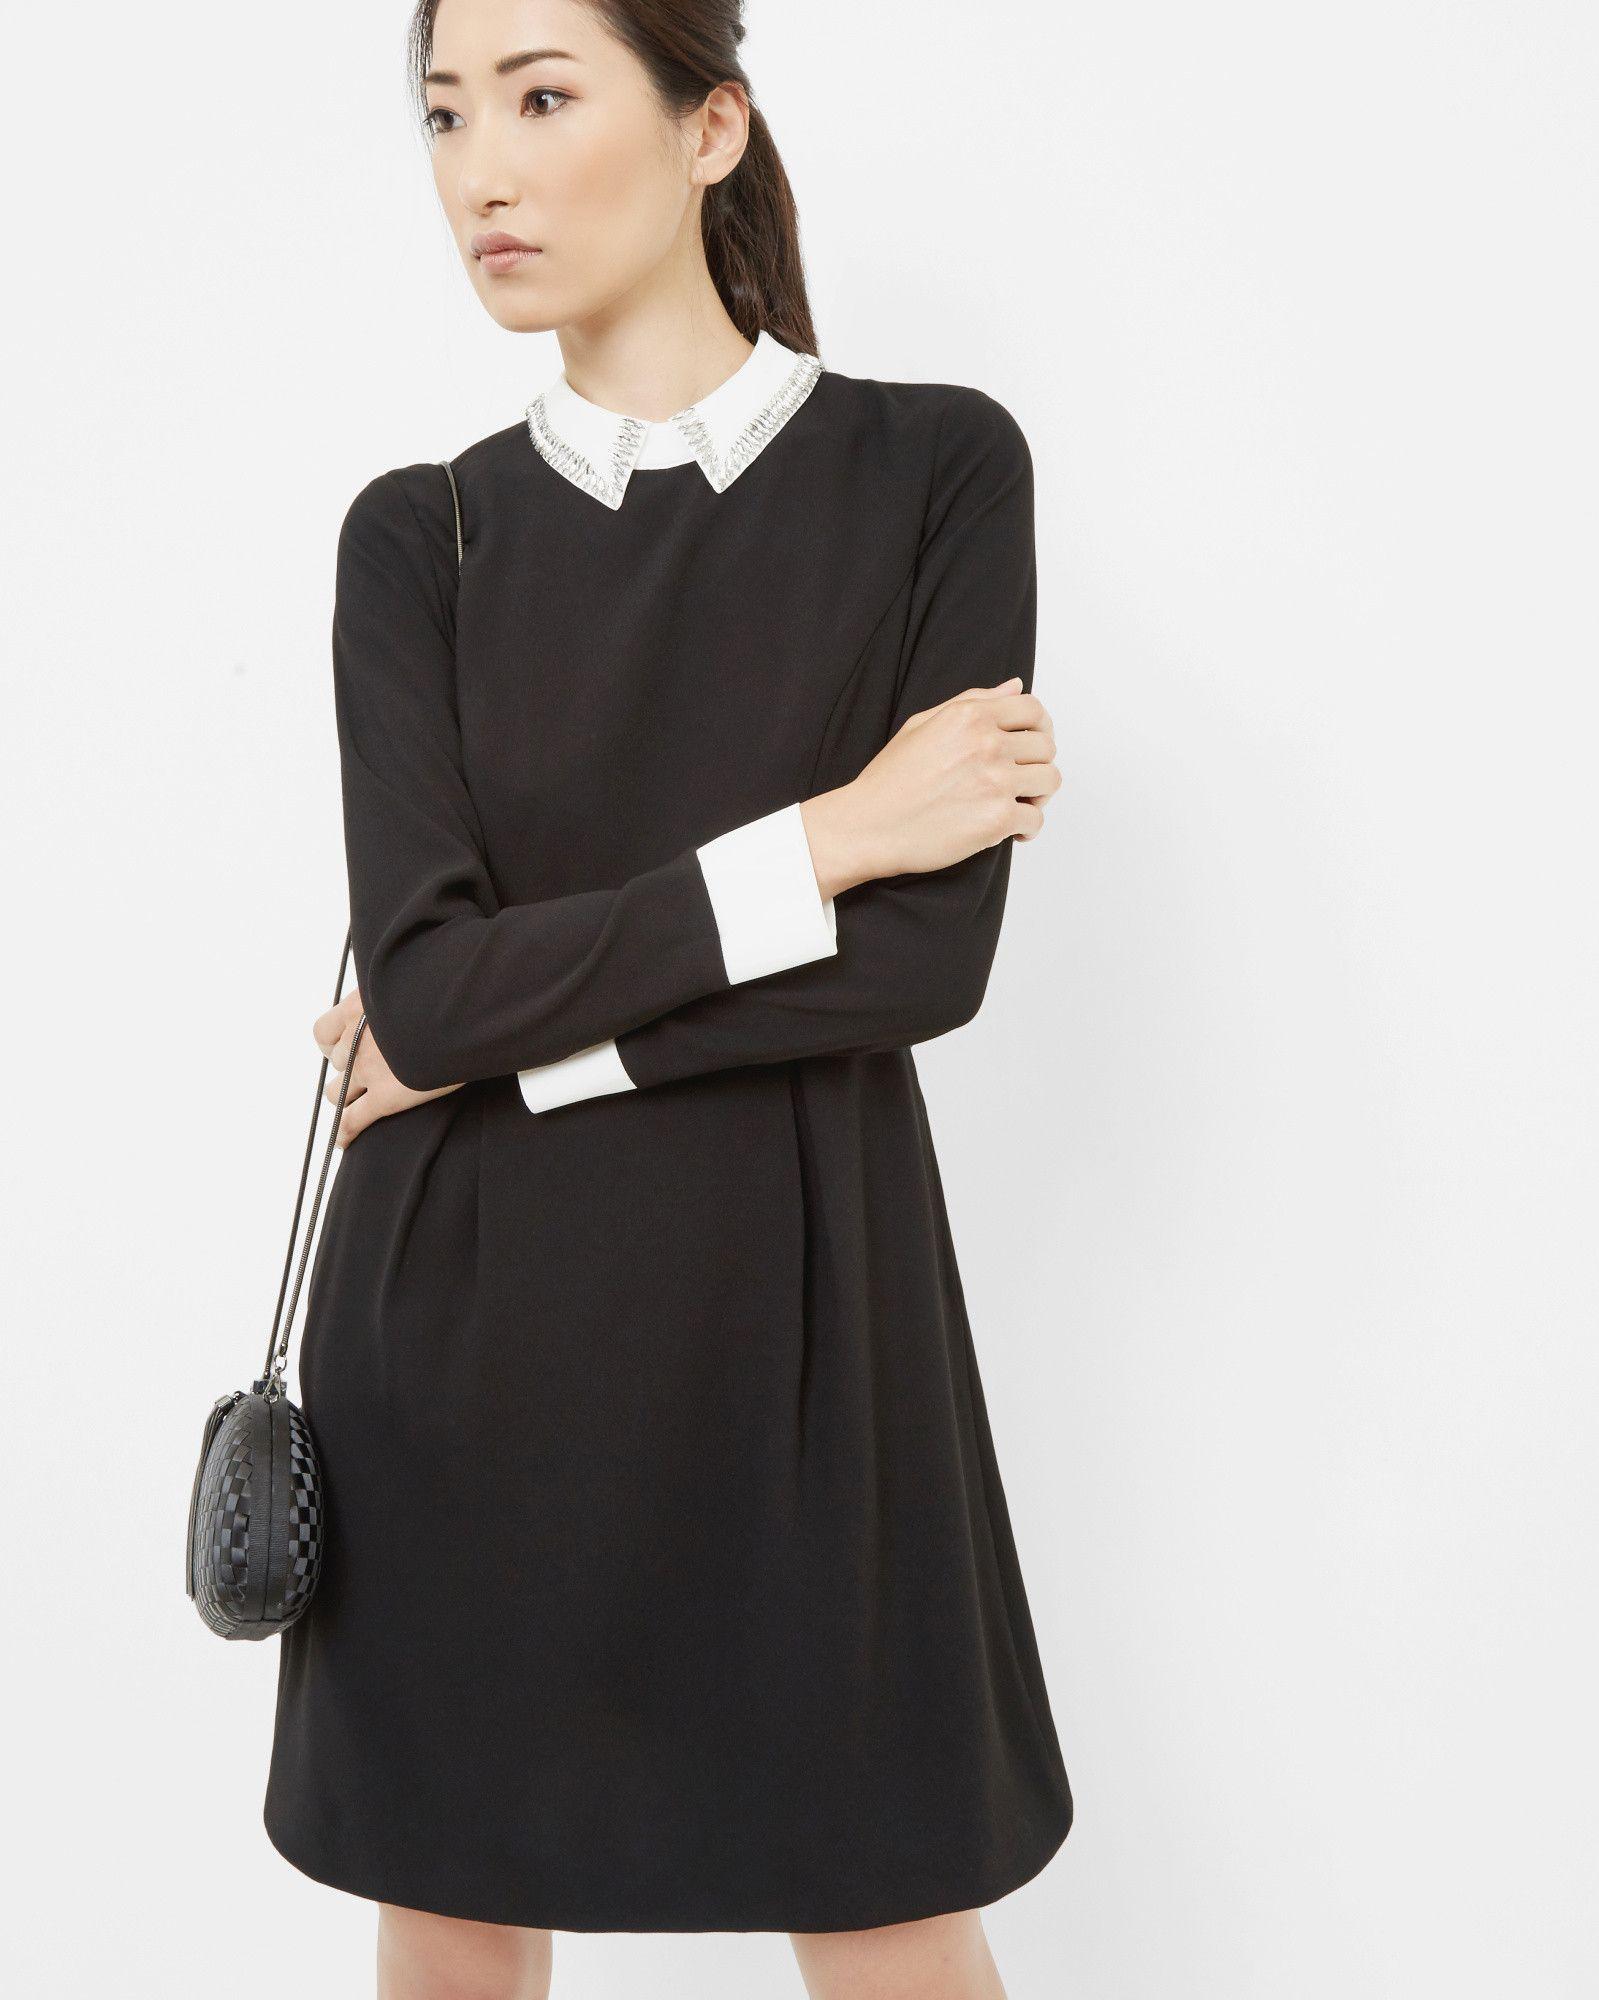 Embellished Collared Dress Black Dresses Ted Baker Designer Outfits Woman Fashion Dresses [ 2000 x 1599 Pixel ]